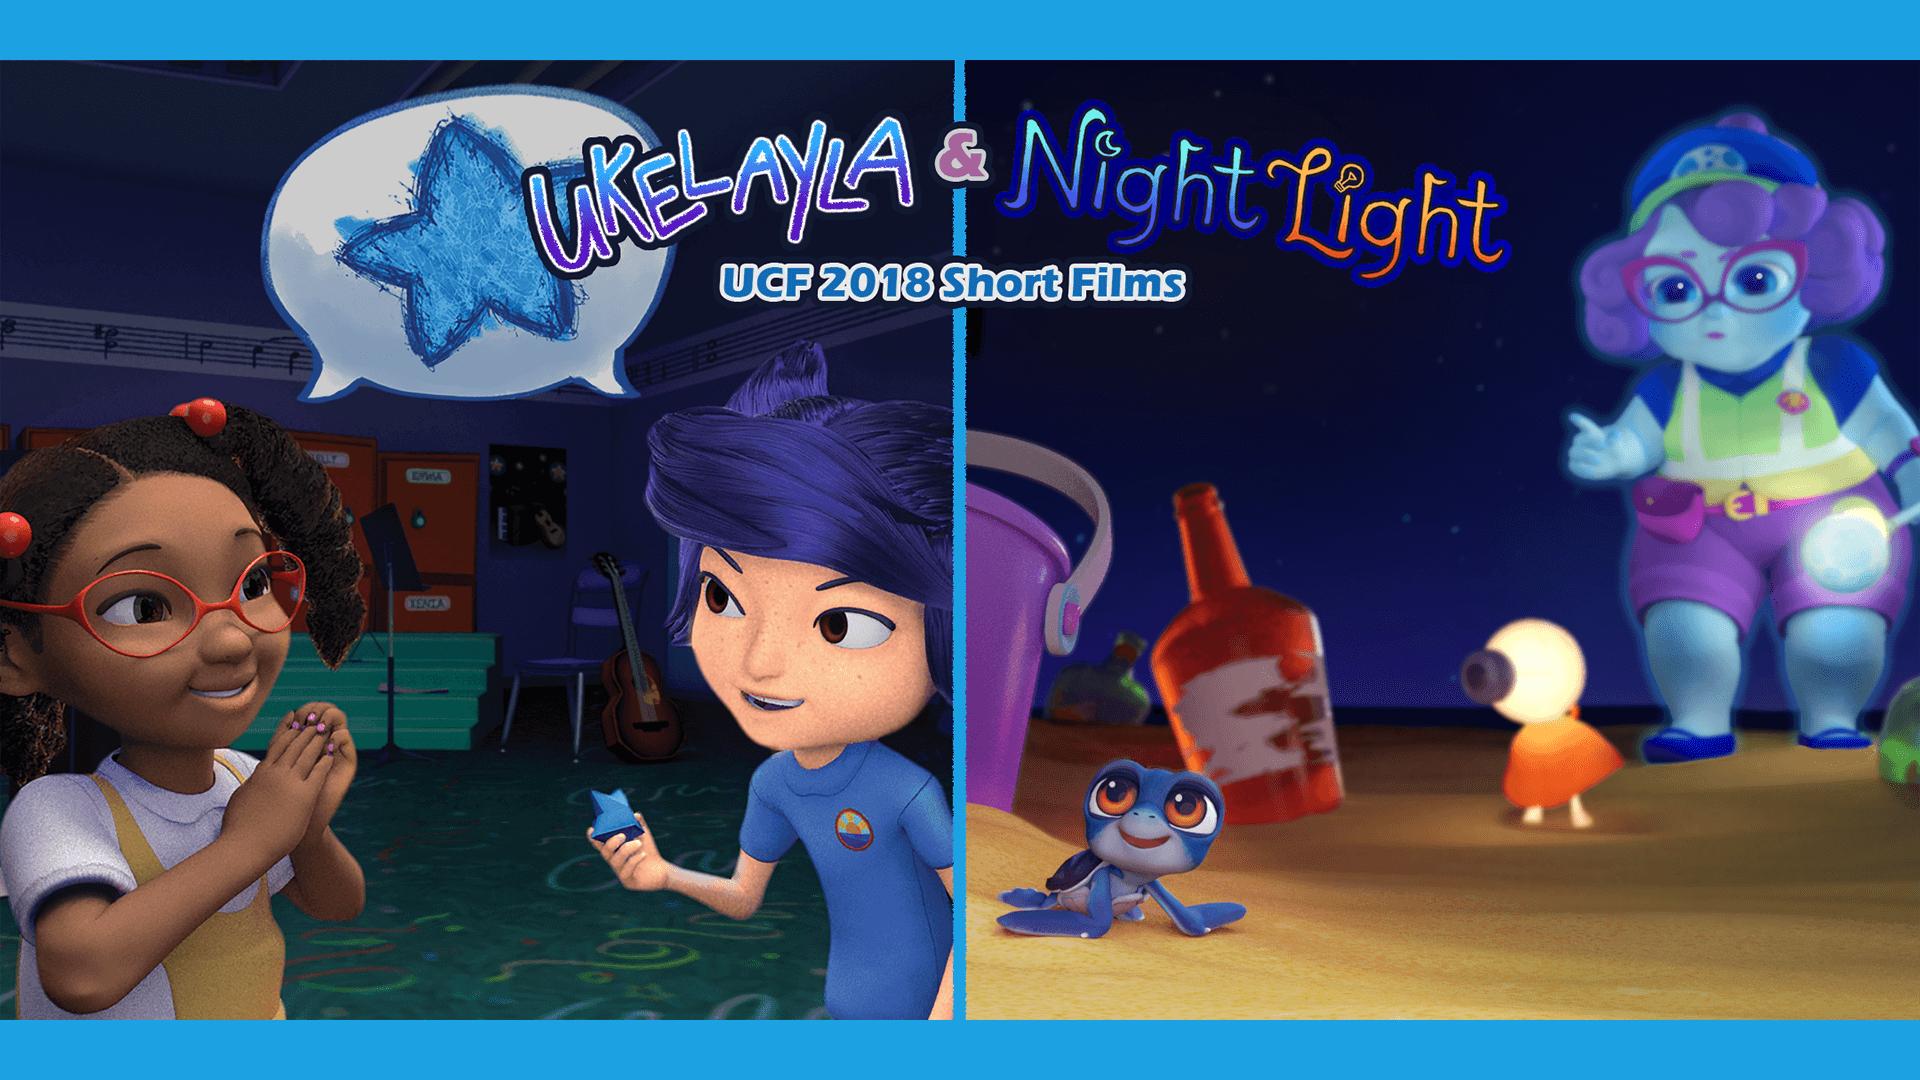 Ukelayla and night light UCF 2018 Short Films Poster